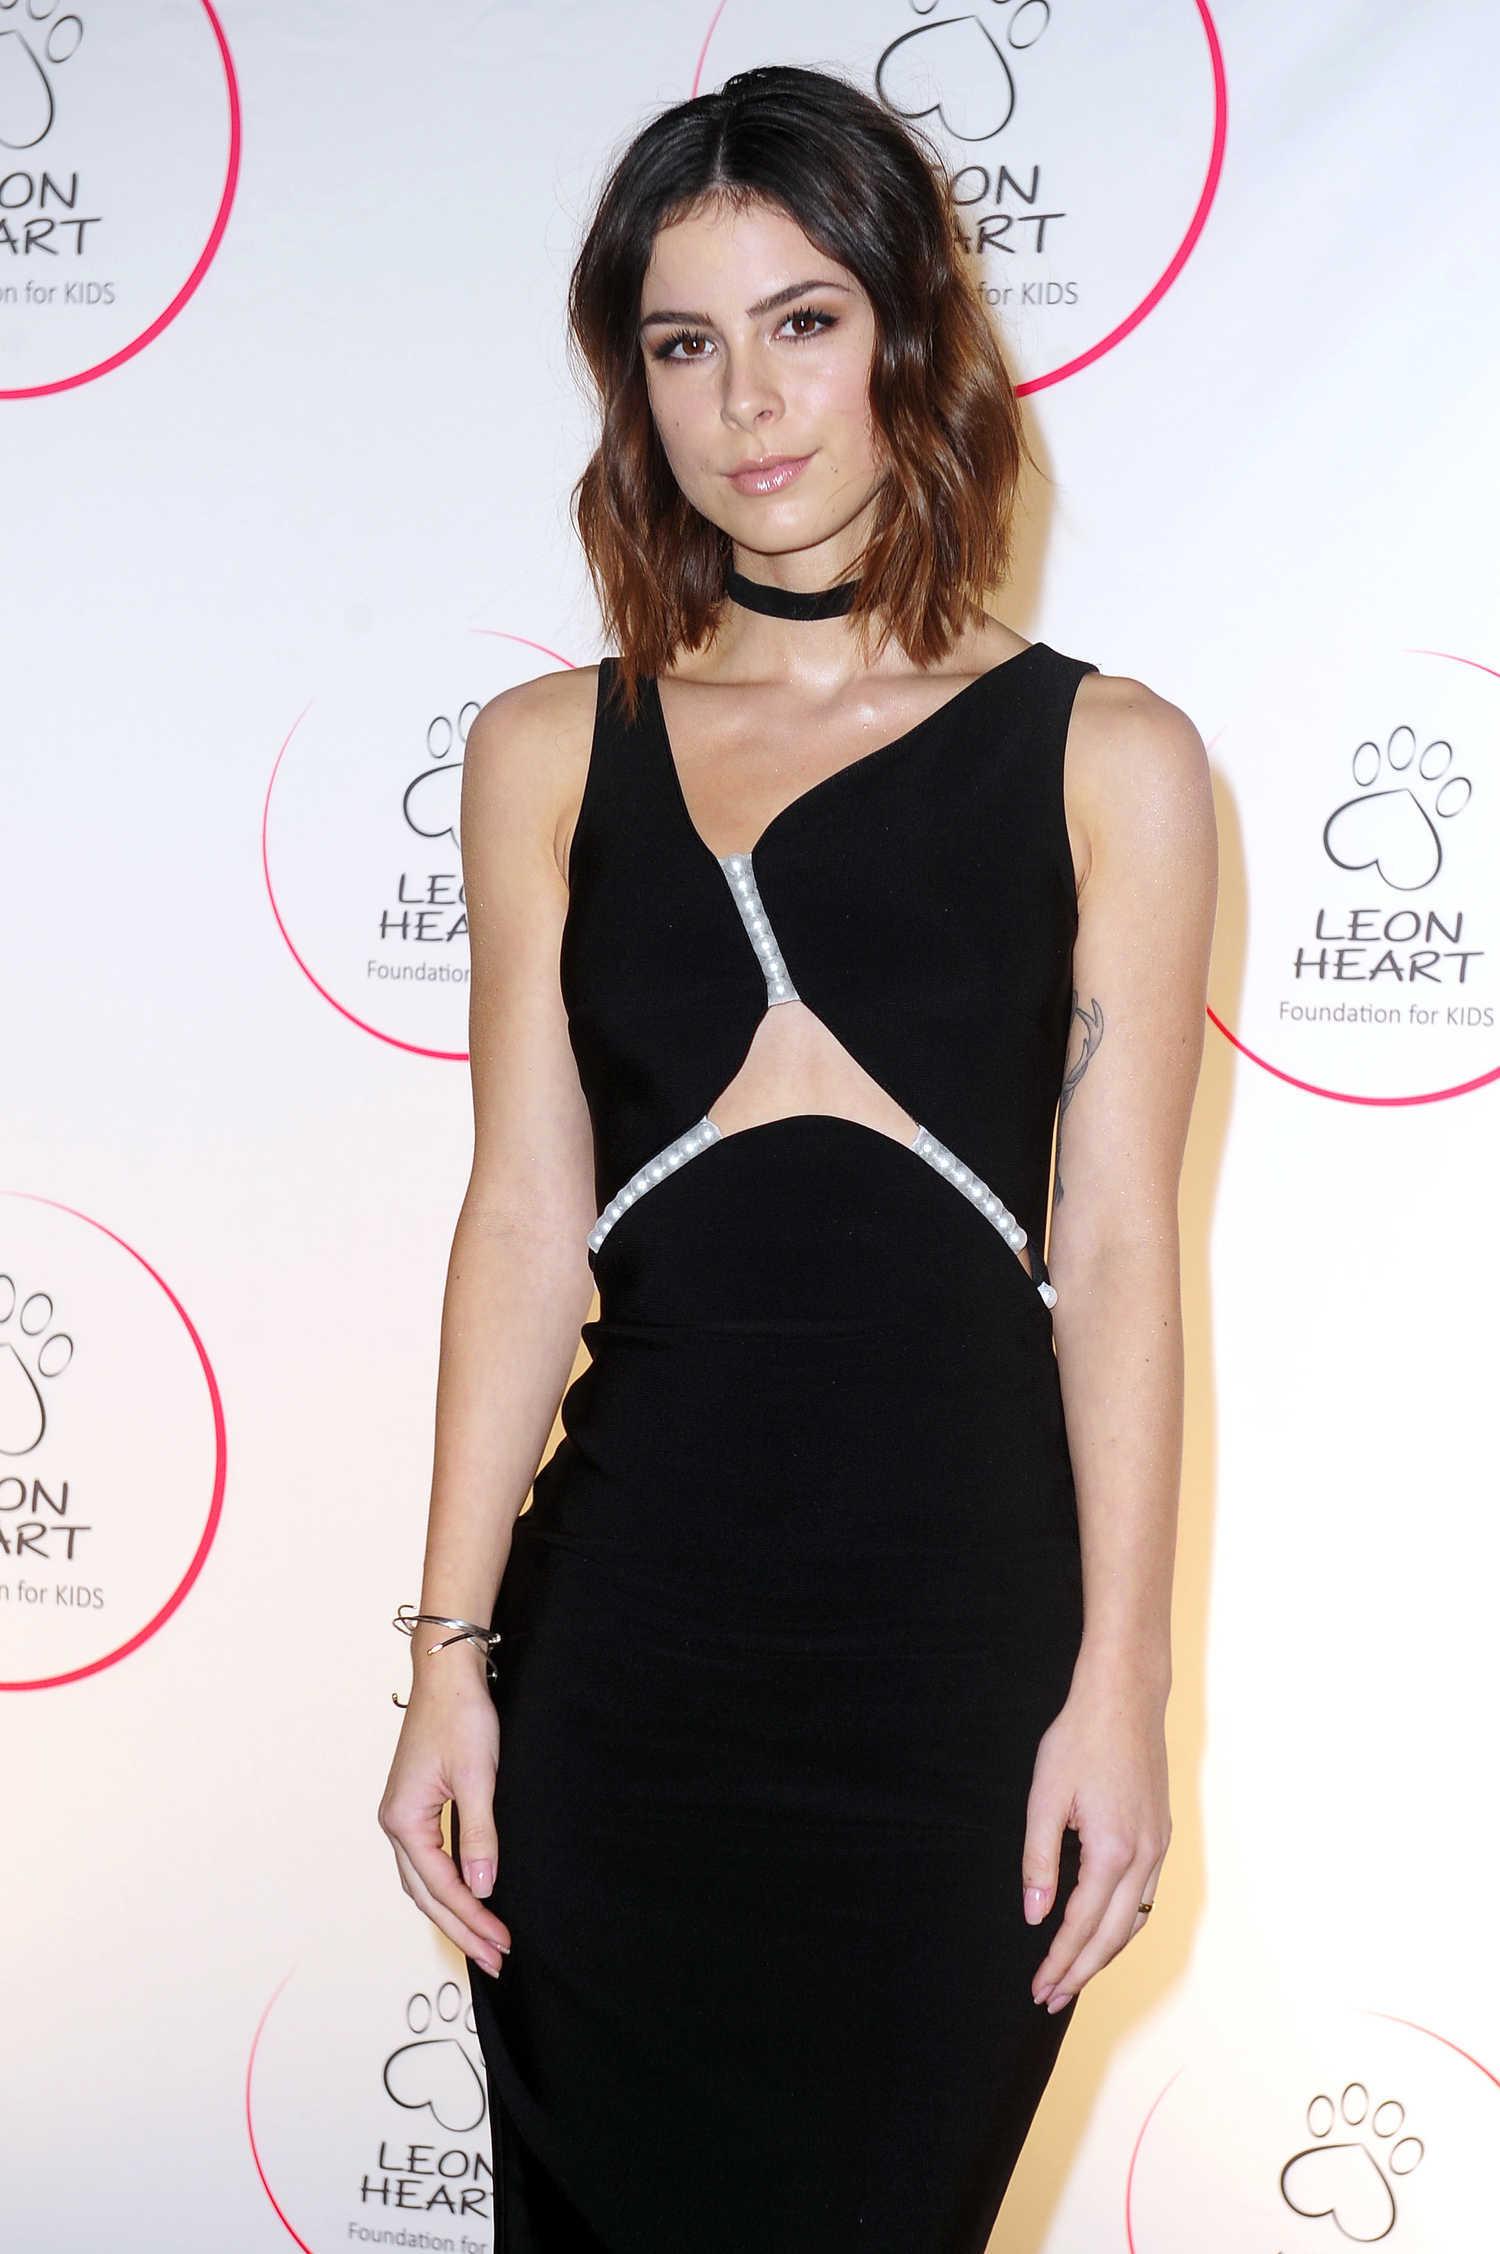 Lena Meyer-Landrut at the Leon Heart Foundation Charity